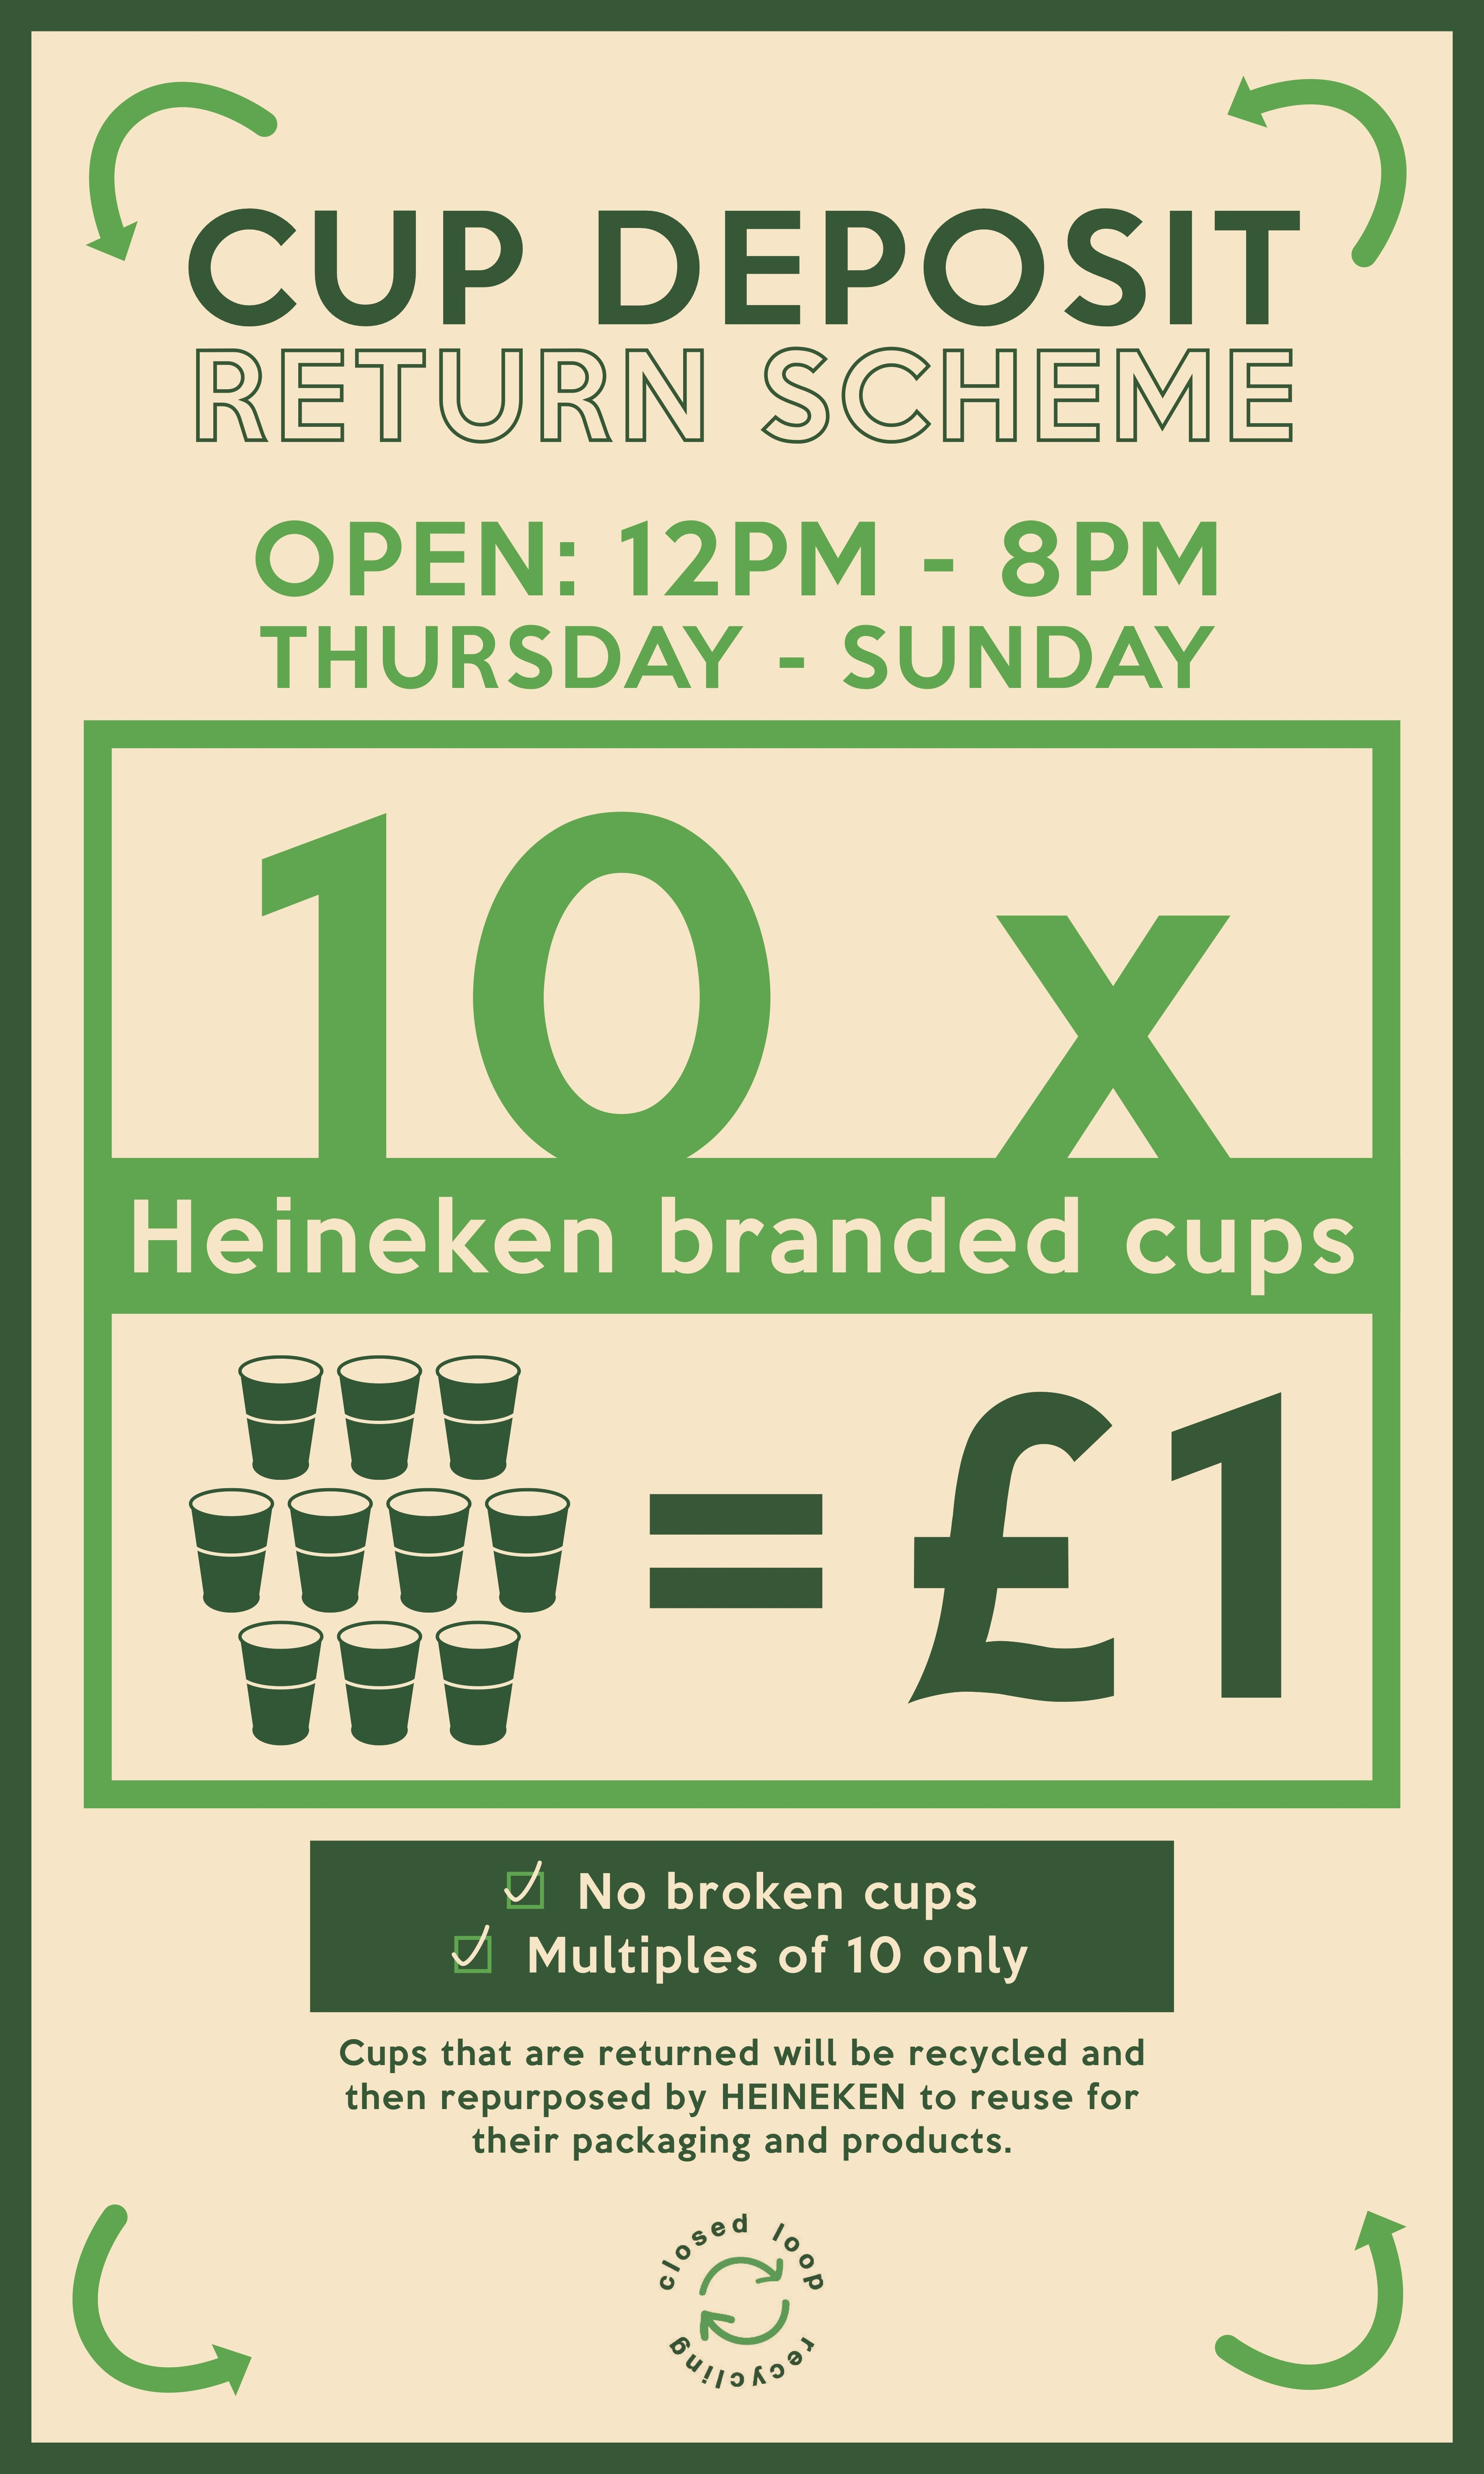 All new 10p cup deposit scheme